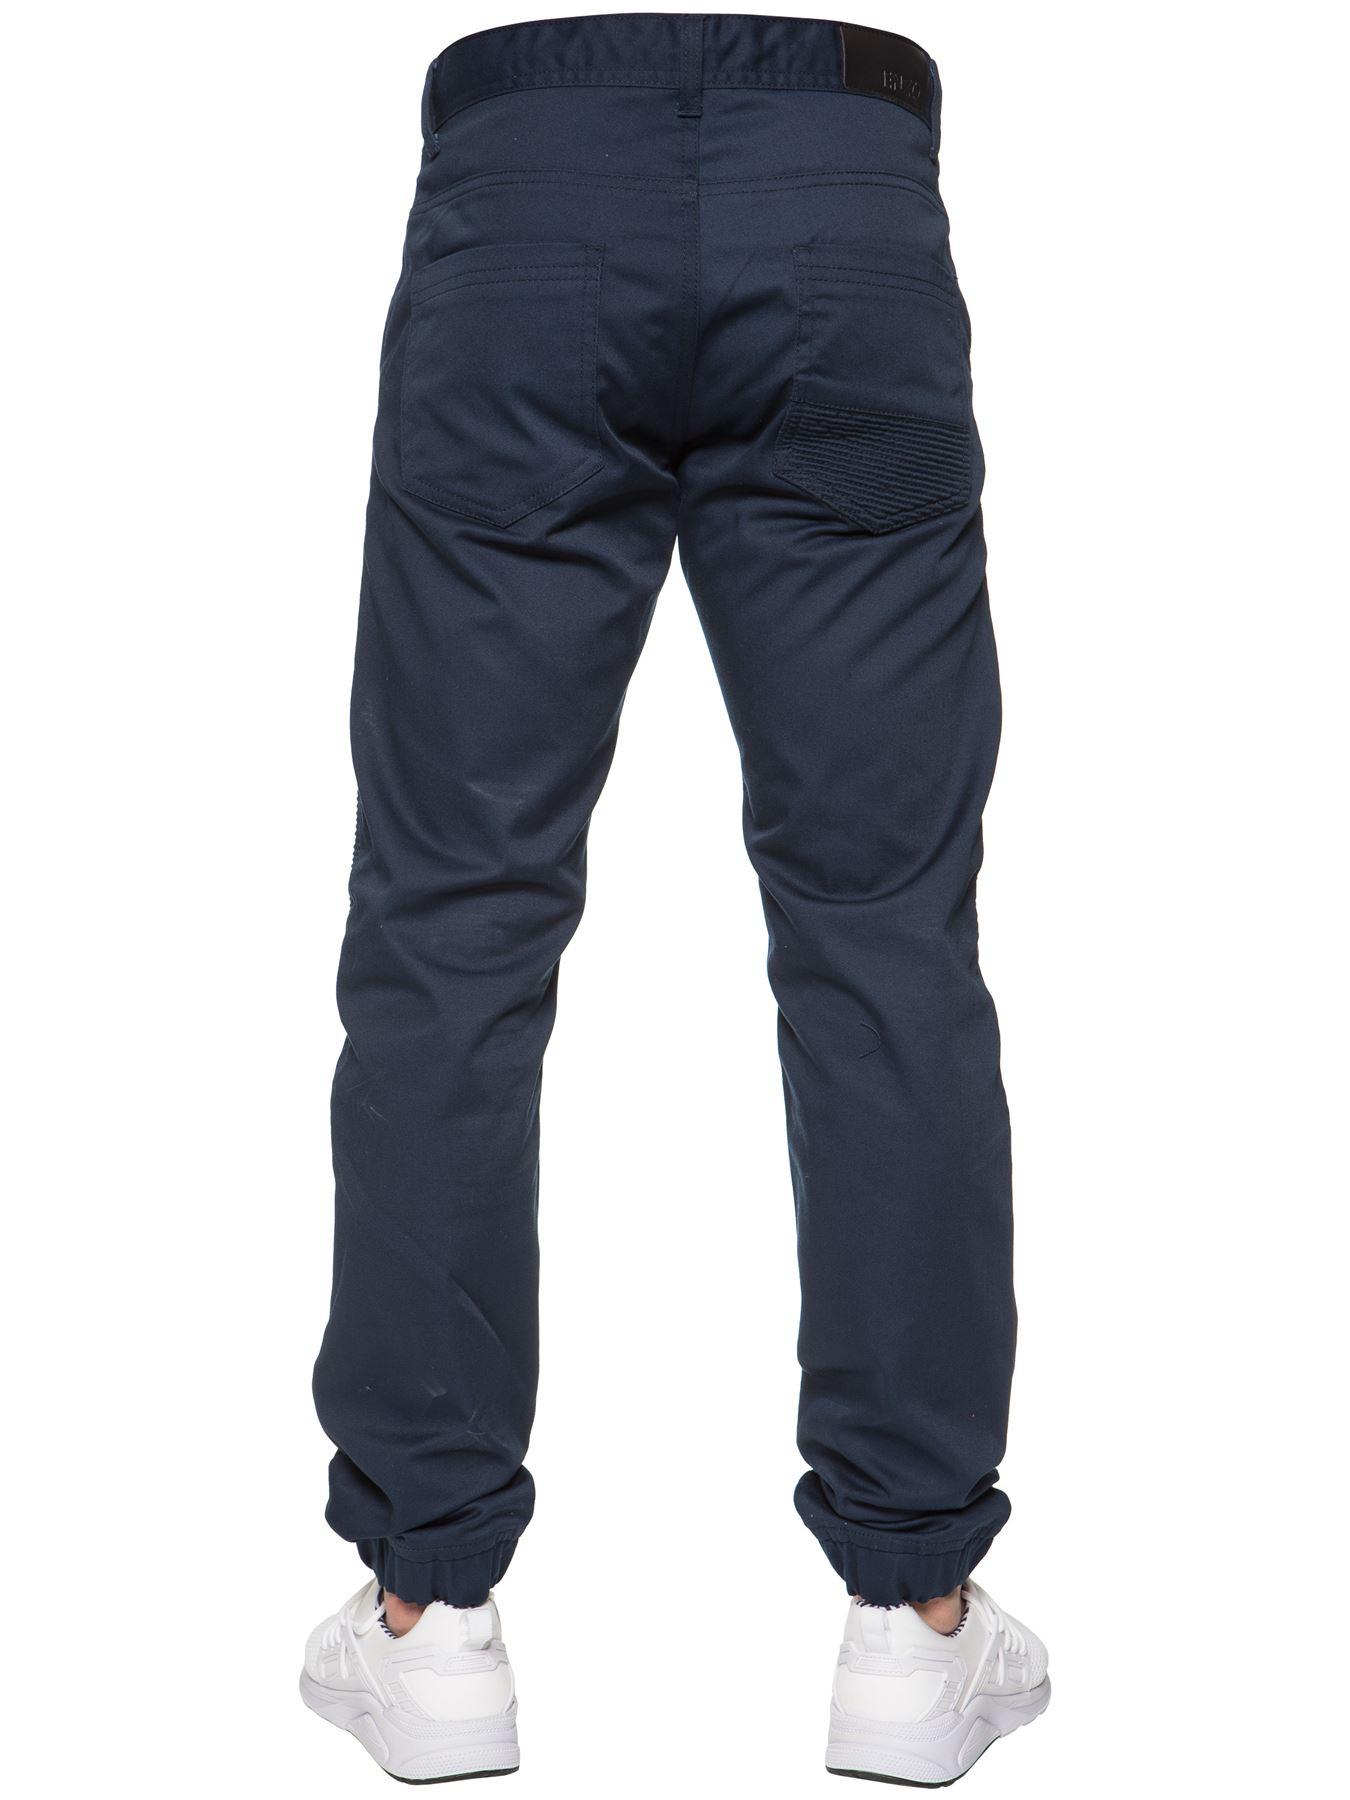 Enzo-Designer-Mens-Cuffed-Chinos-Biker-Jeans-Slim-Denim-Trousers-Pants-Joggers thumbnail 8